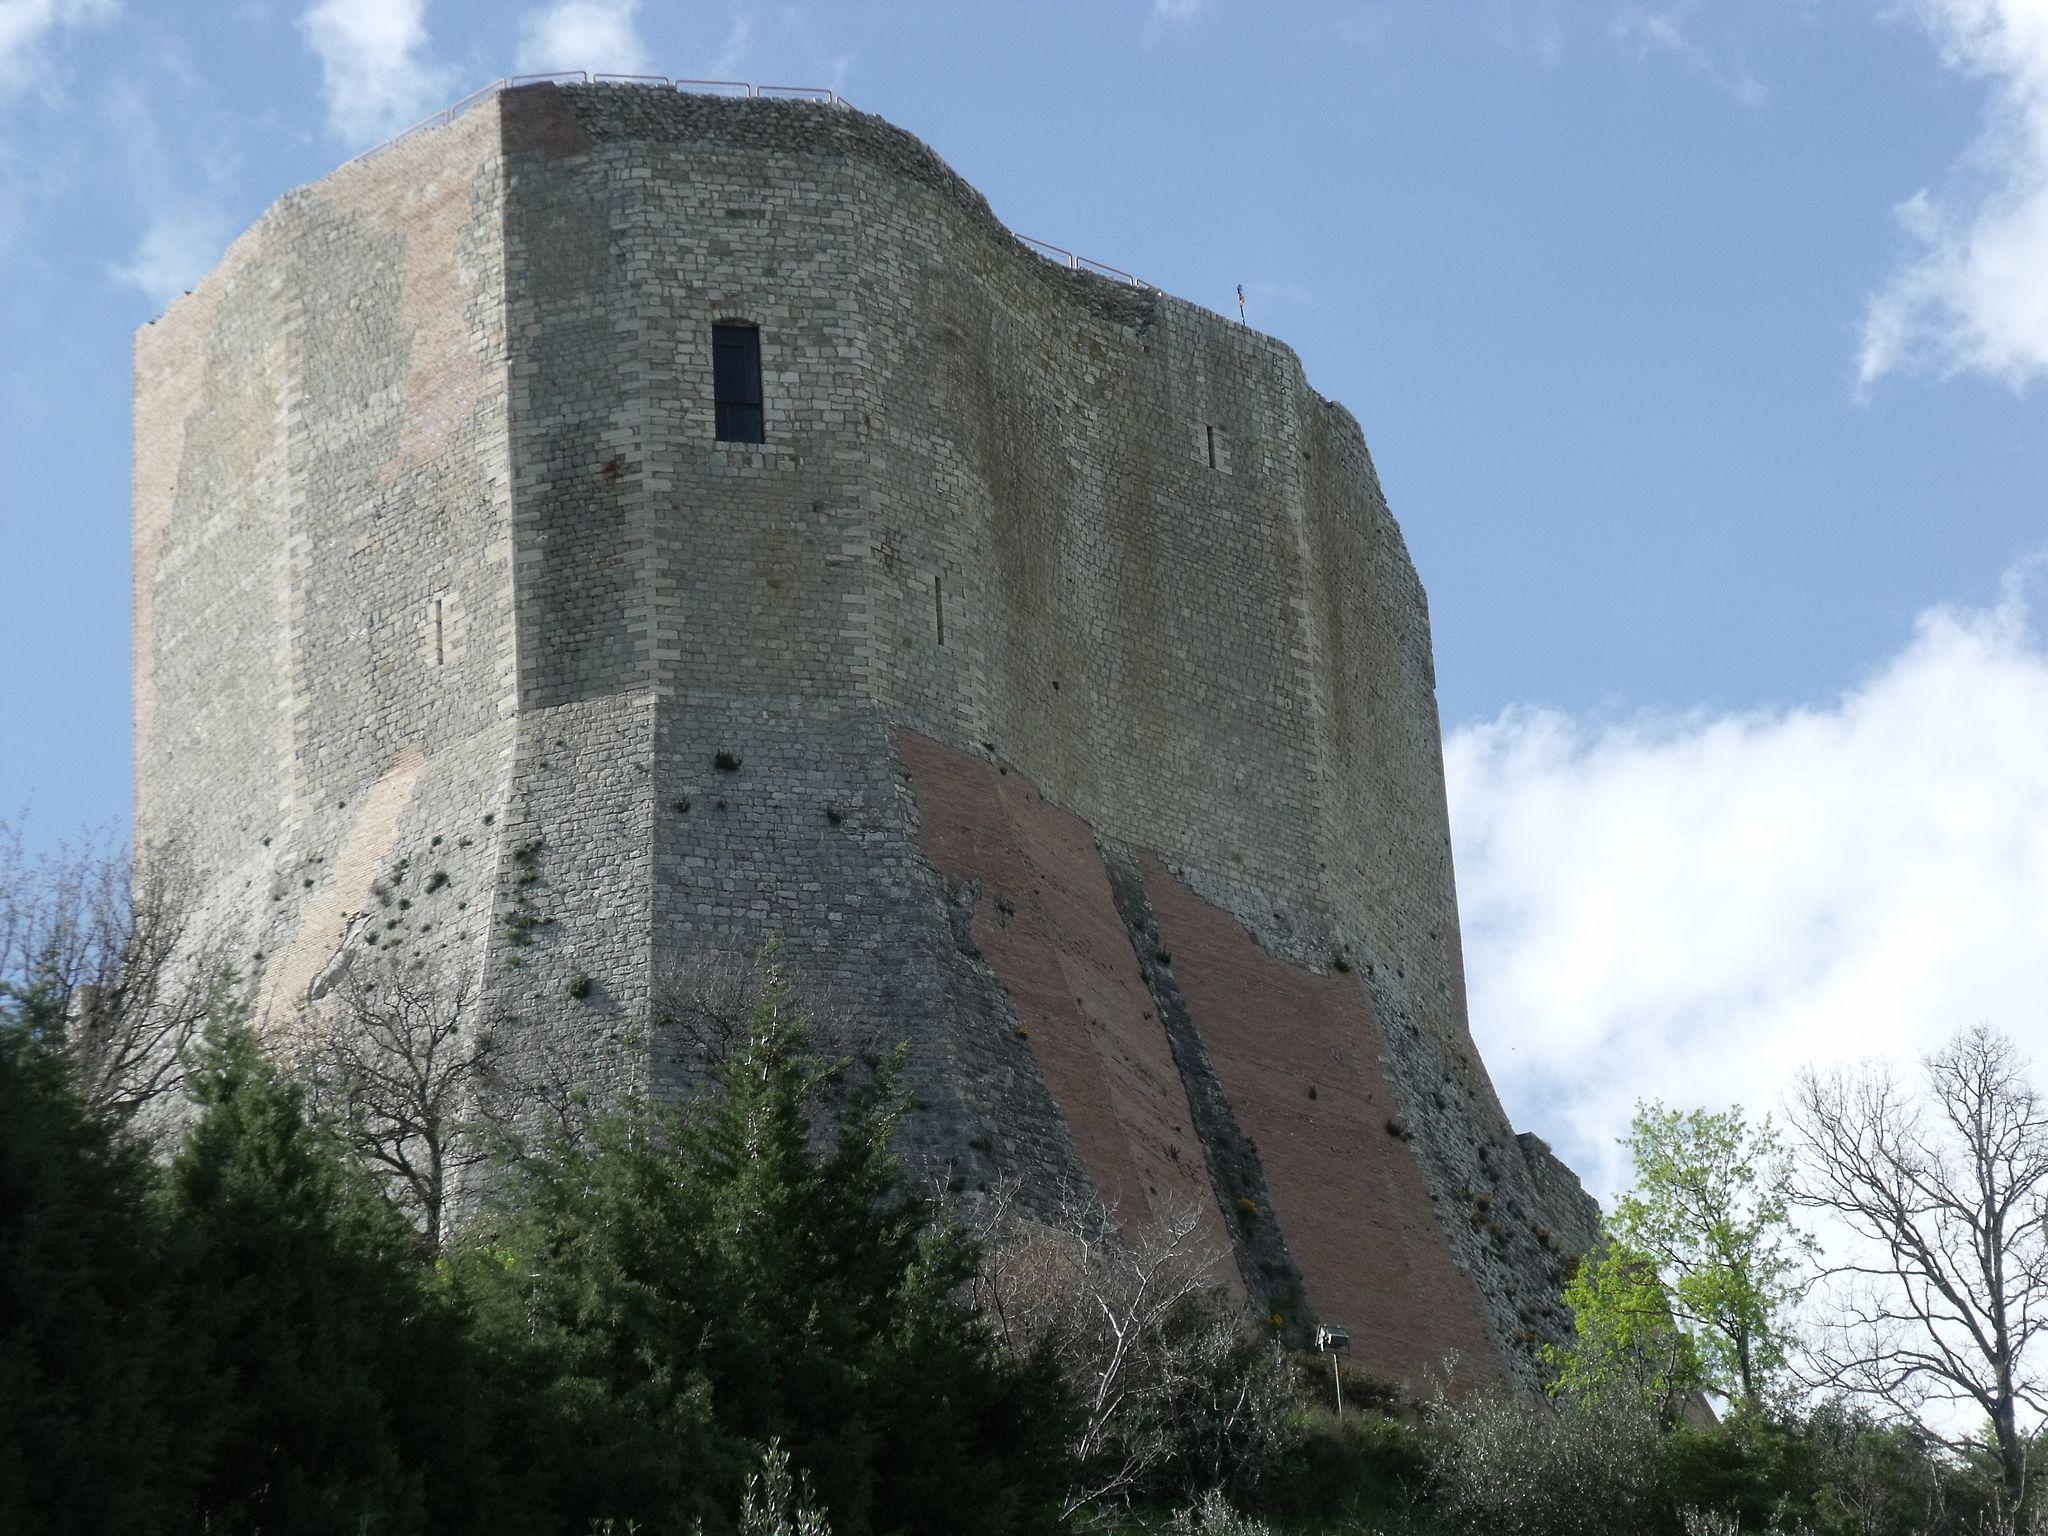 Die Burg Rocca d'Orcia, auch Rocca di Tentennano, Tintinnano oder Tintennano genannt, Castiglione d'Orcia, Val d'Orcia [1]